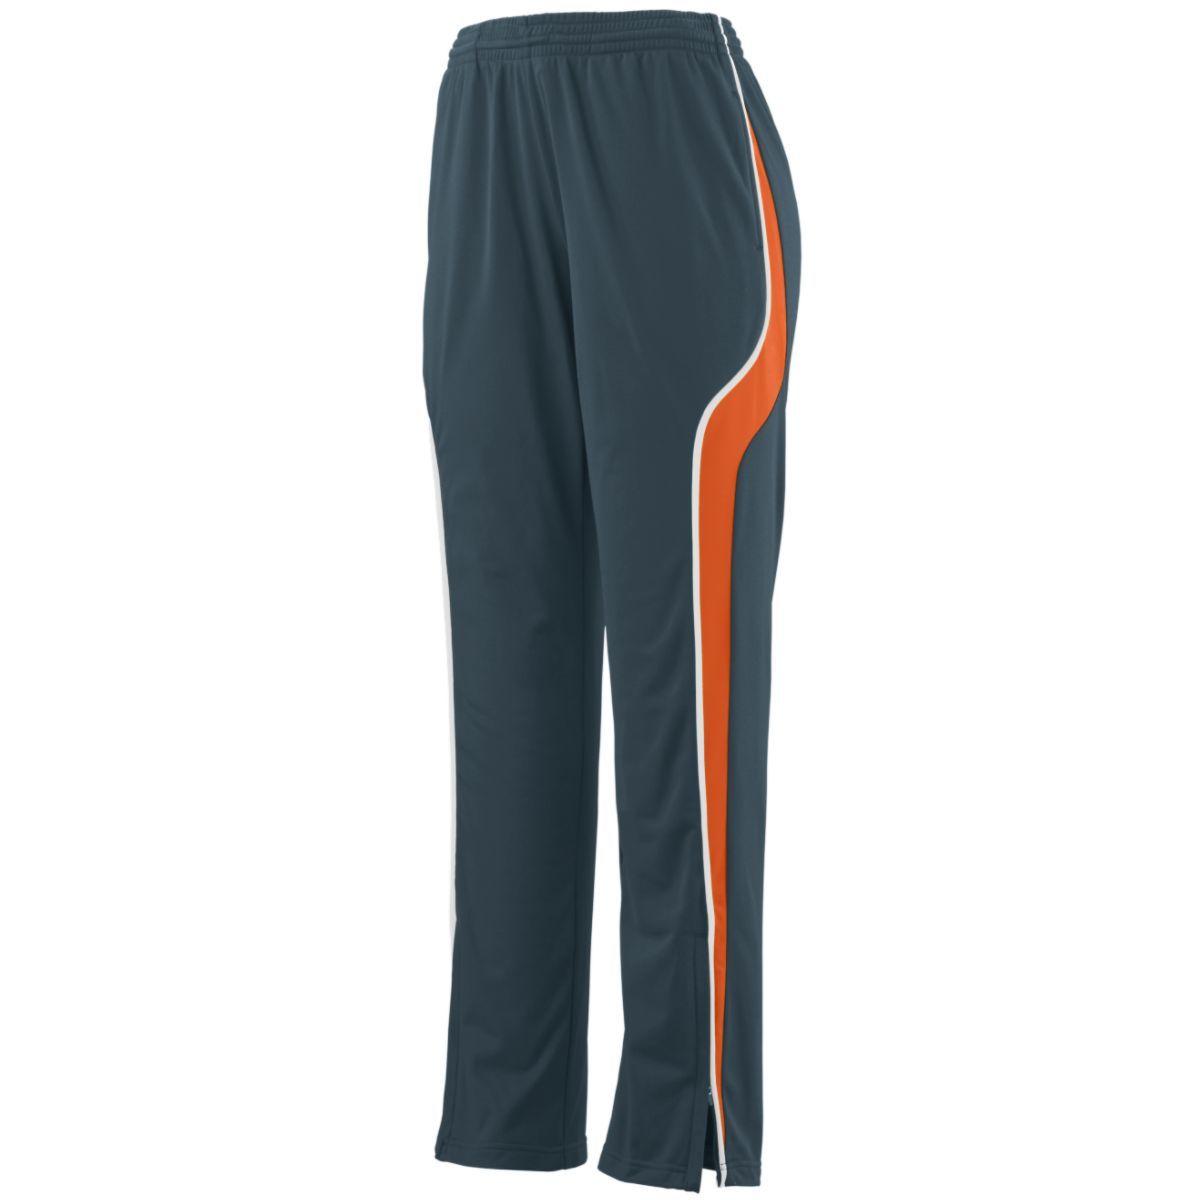 Ladies Rival Pant - SLATE/ORANGE/WHITE